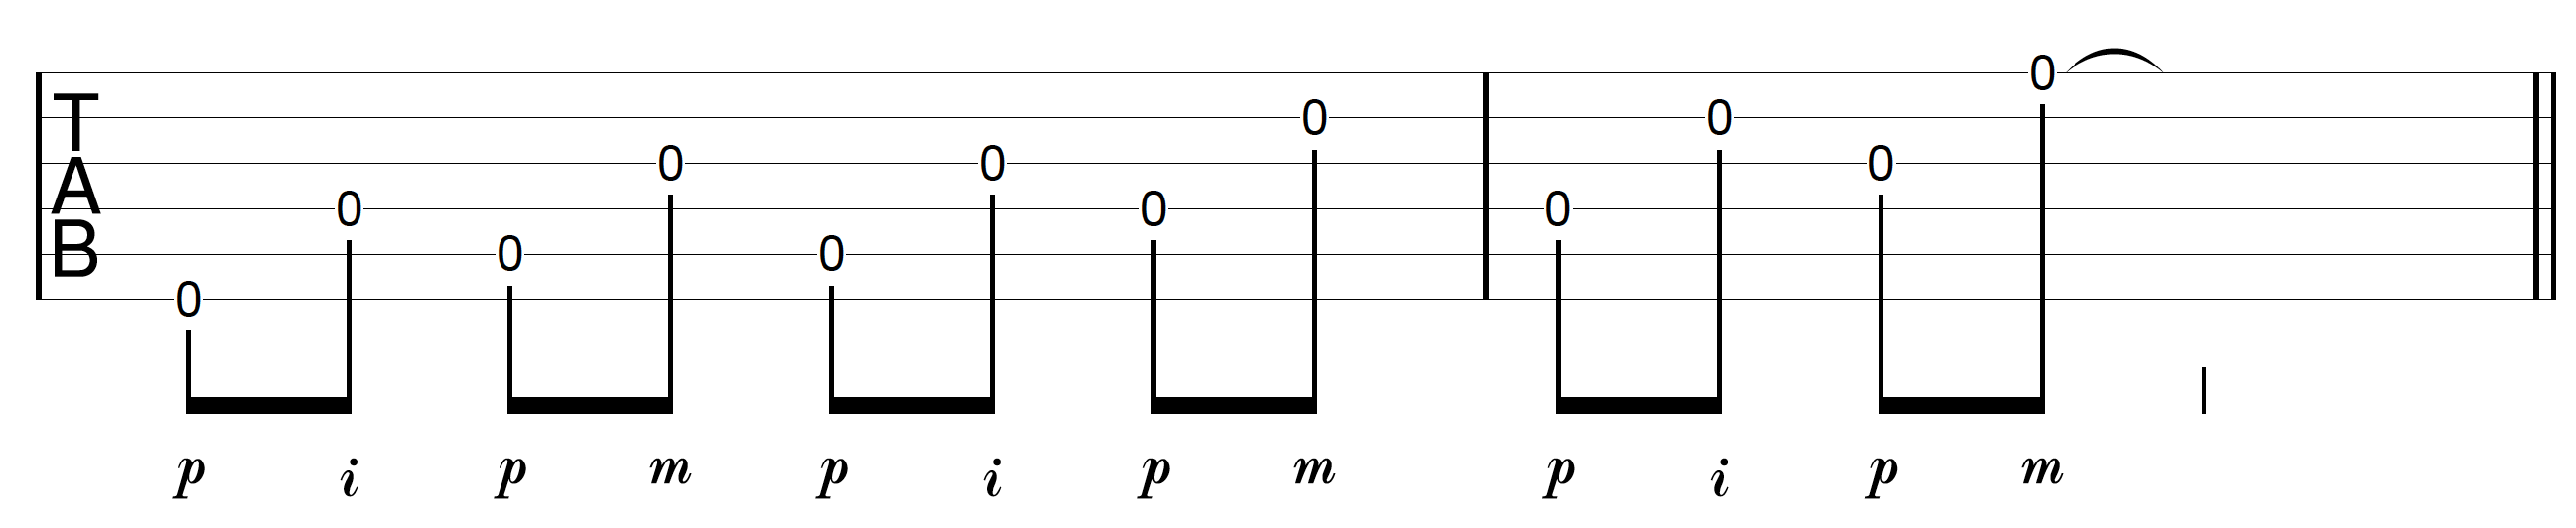 Creative Fingerpicking Guitar Open String Pattern Ascending